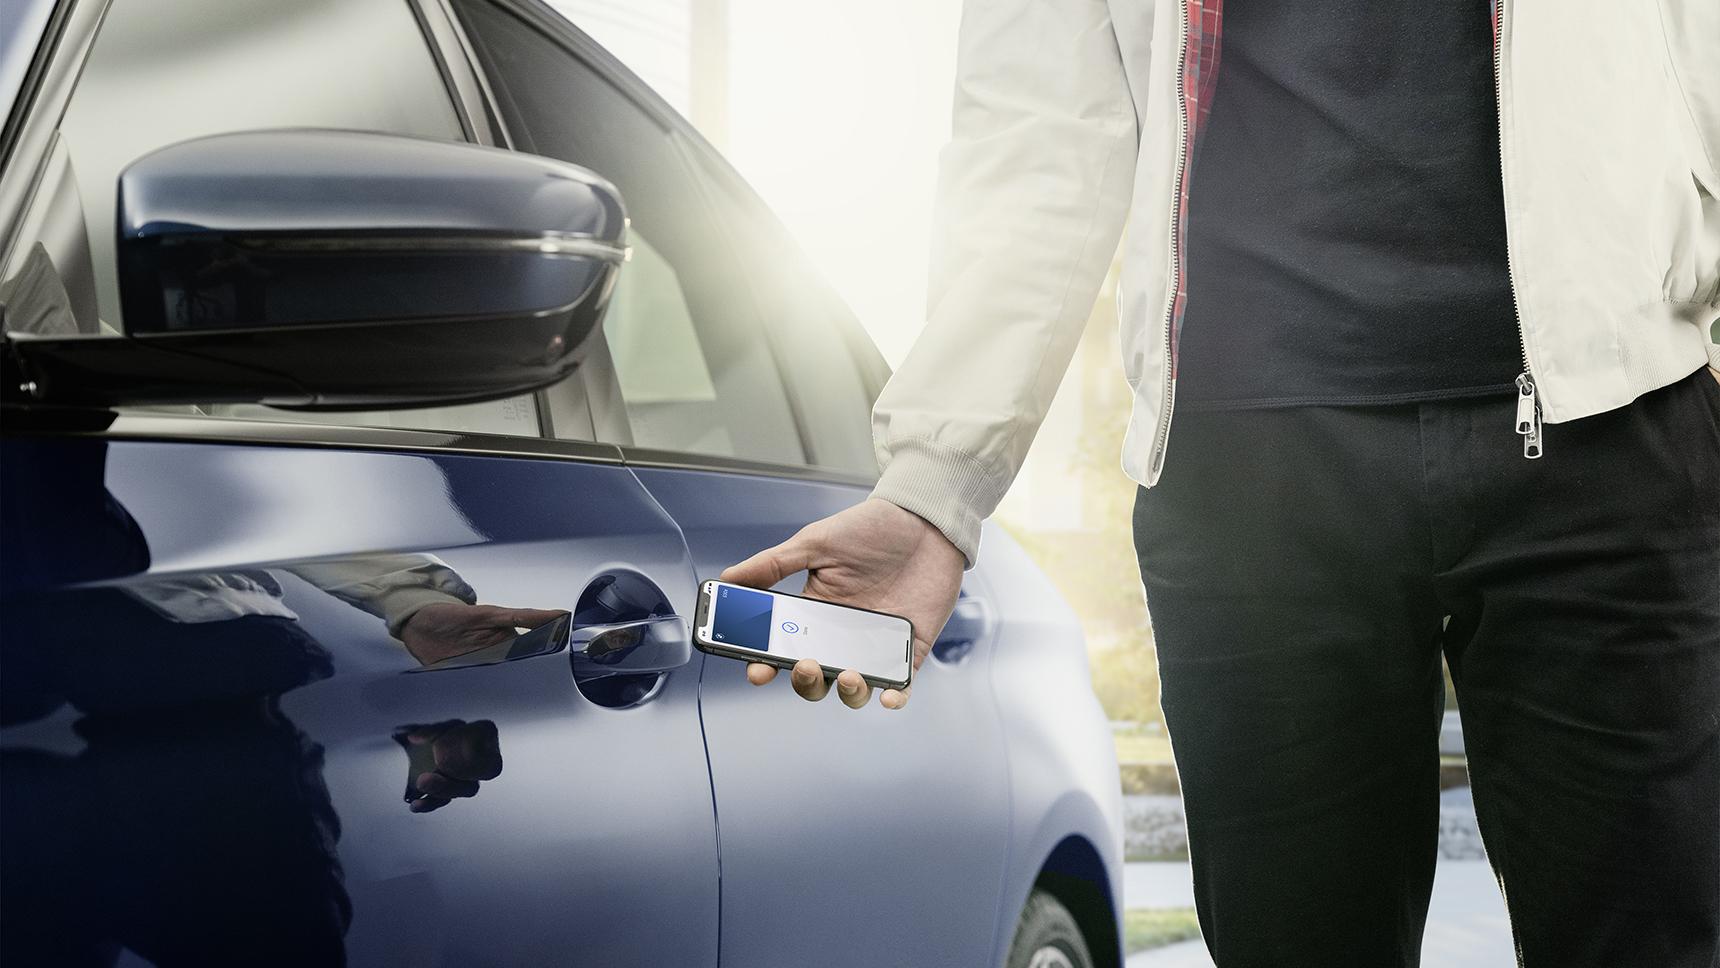 BMW и Apple представили цифровой ключ для автомобилей